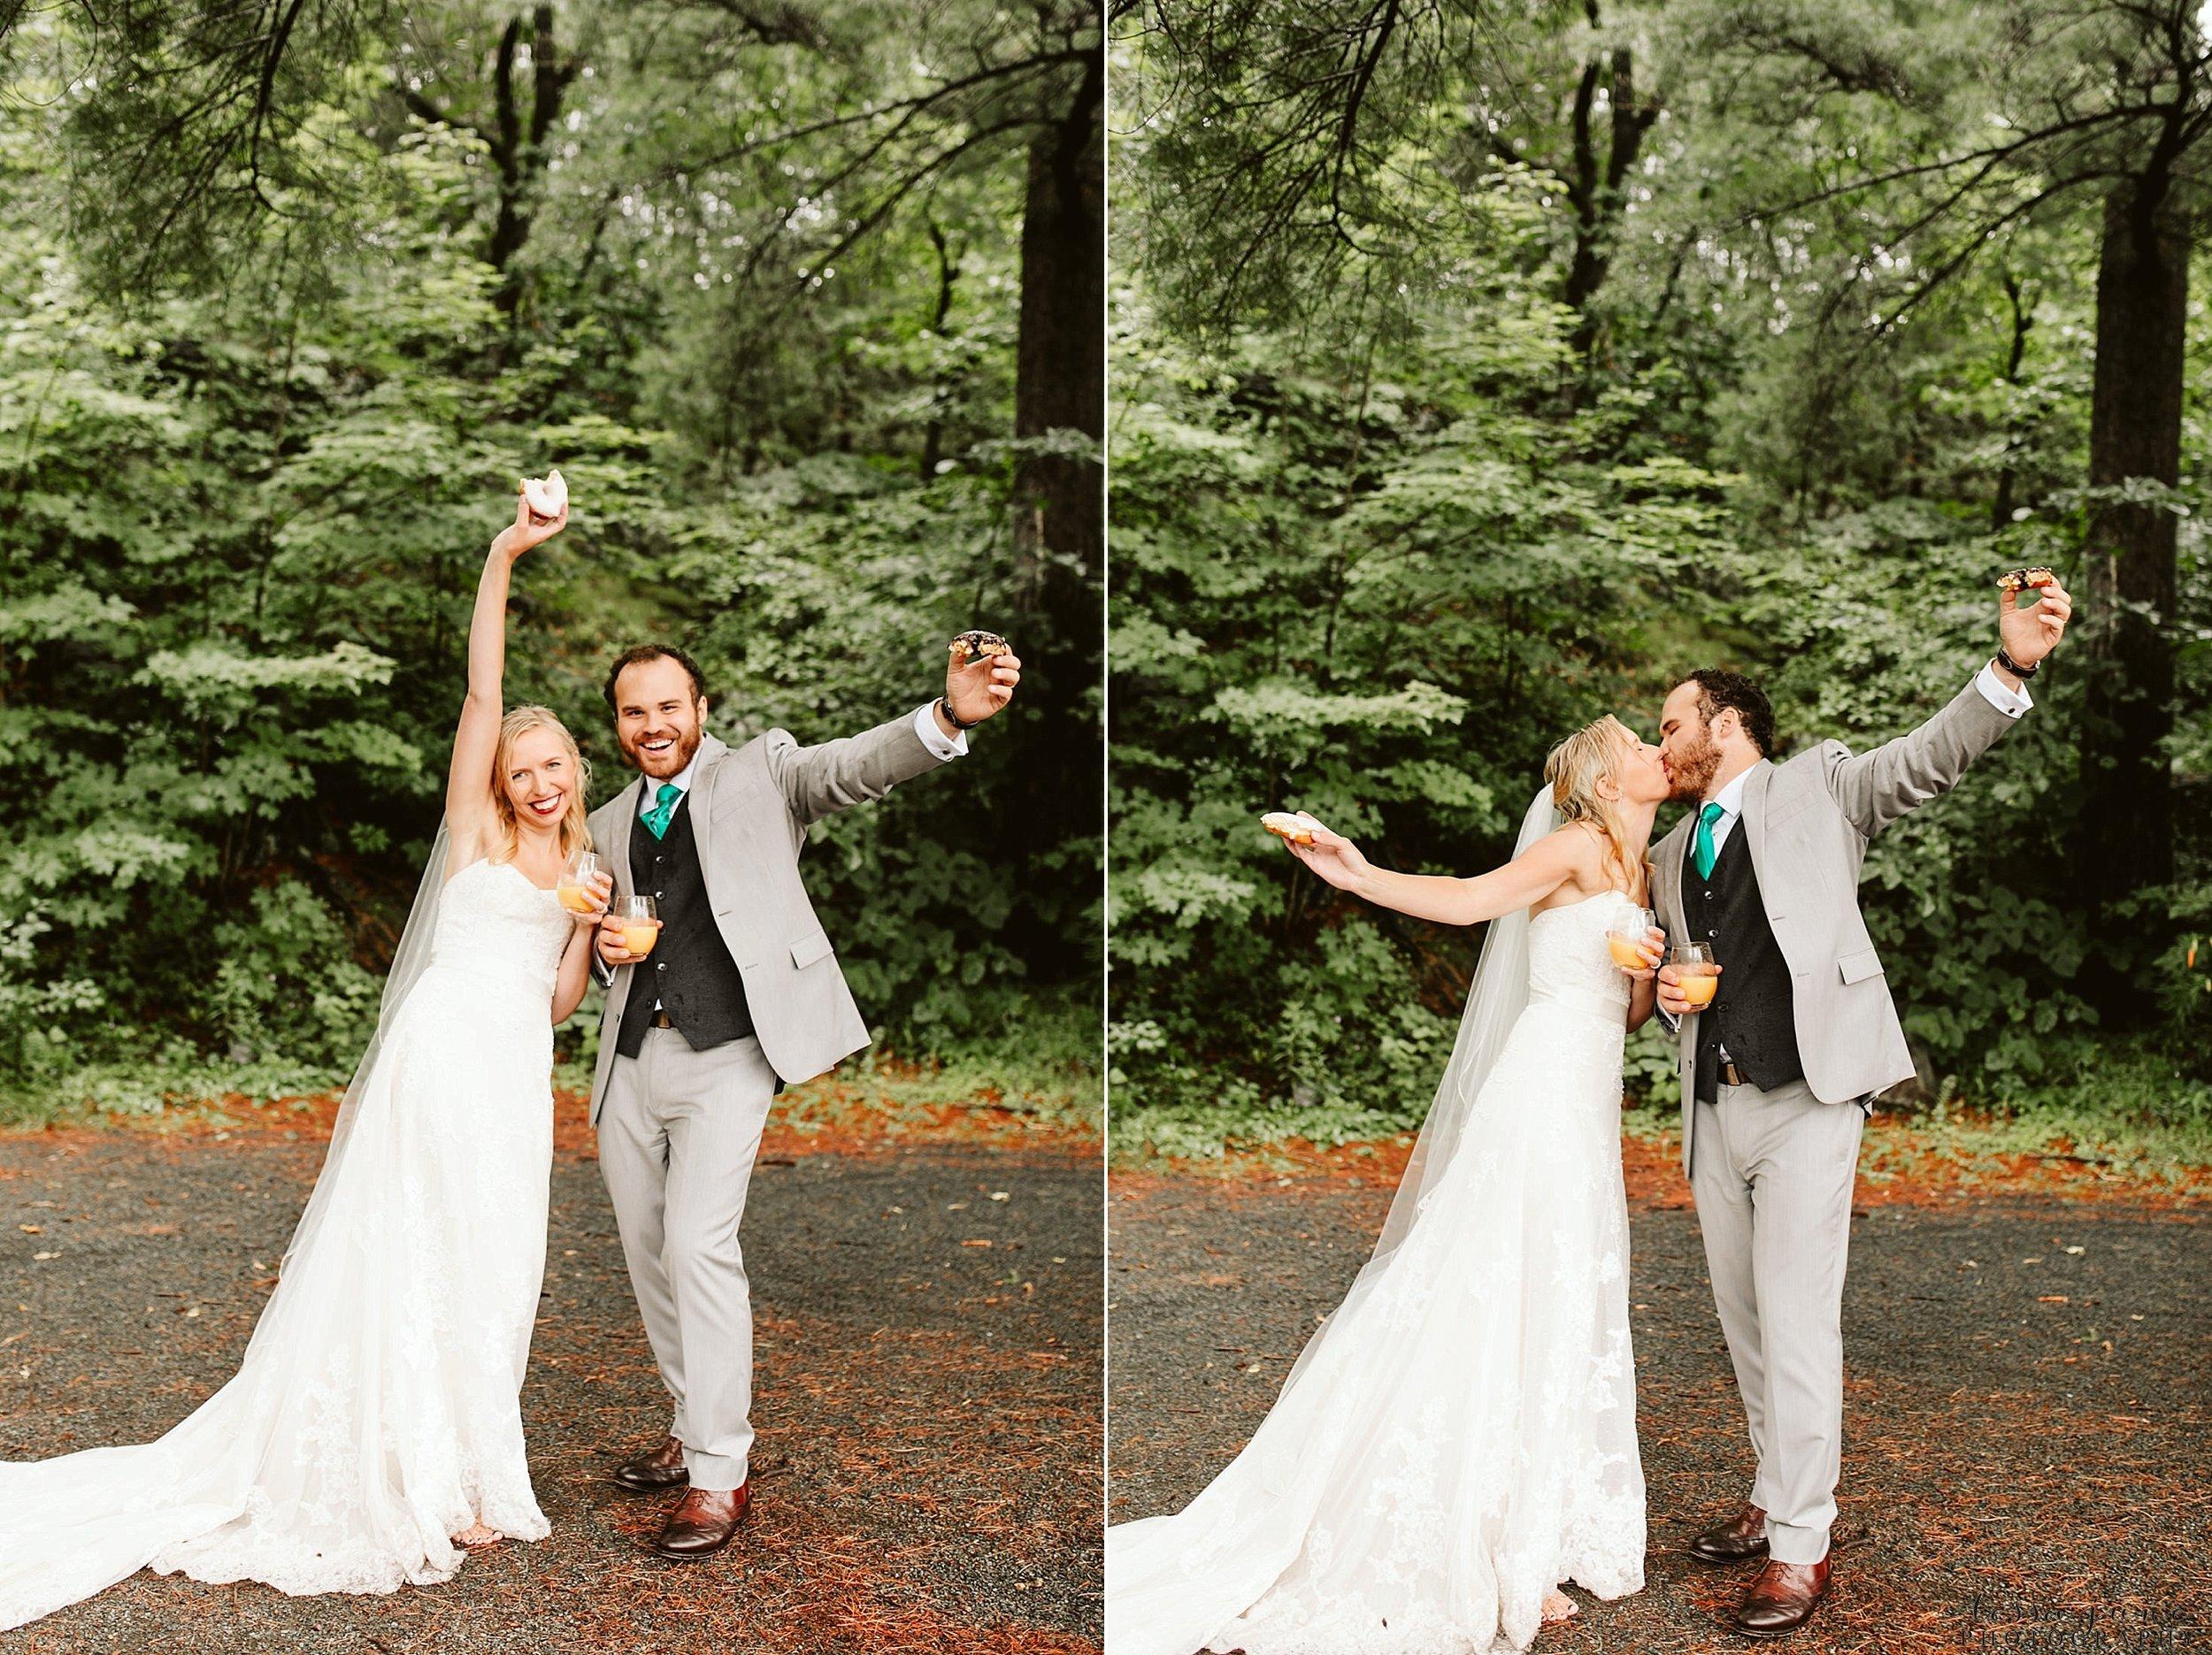 taylors-falls-rainy-elopement-wedding-interstate-state-park-104.jpg